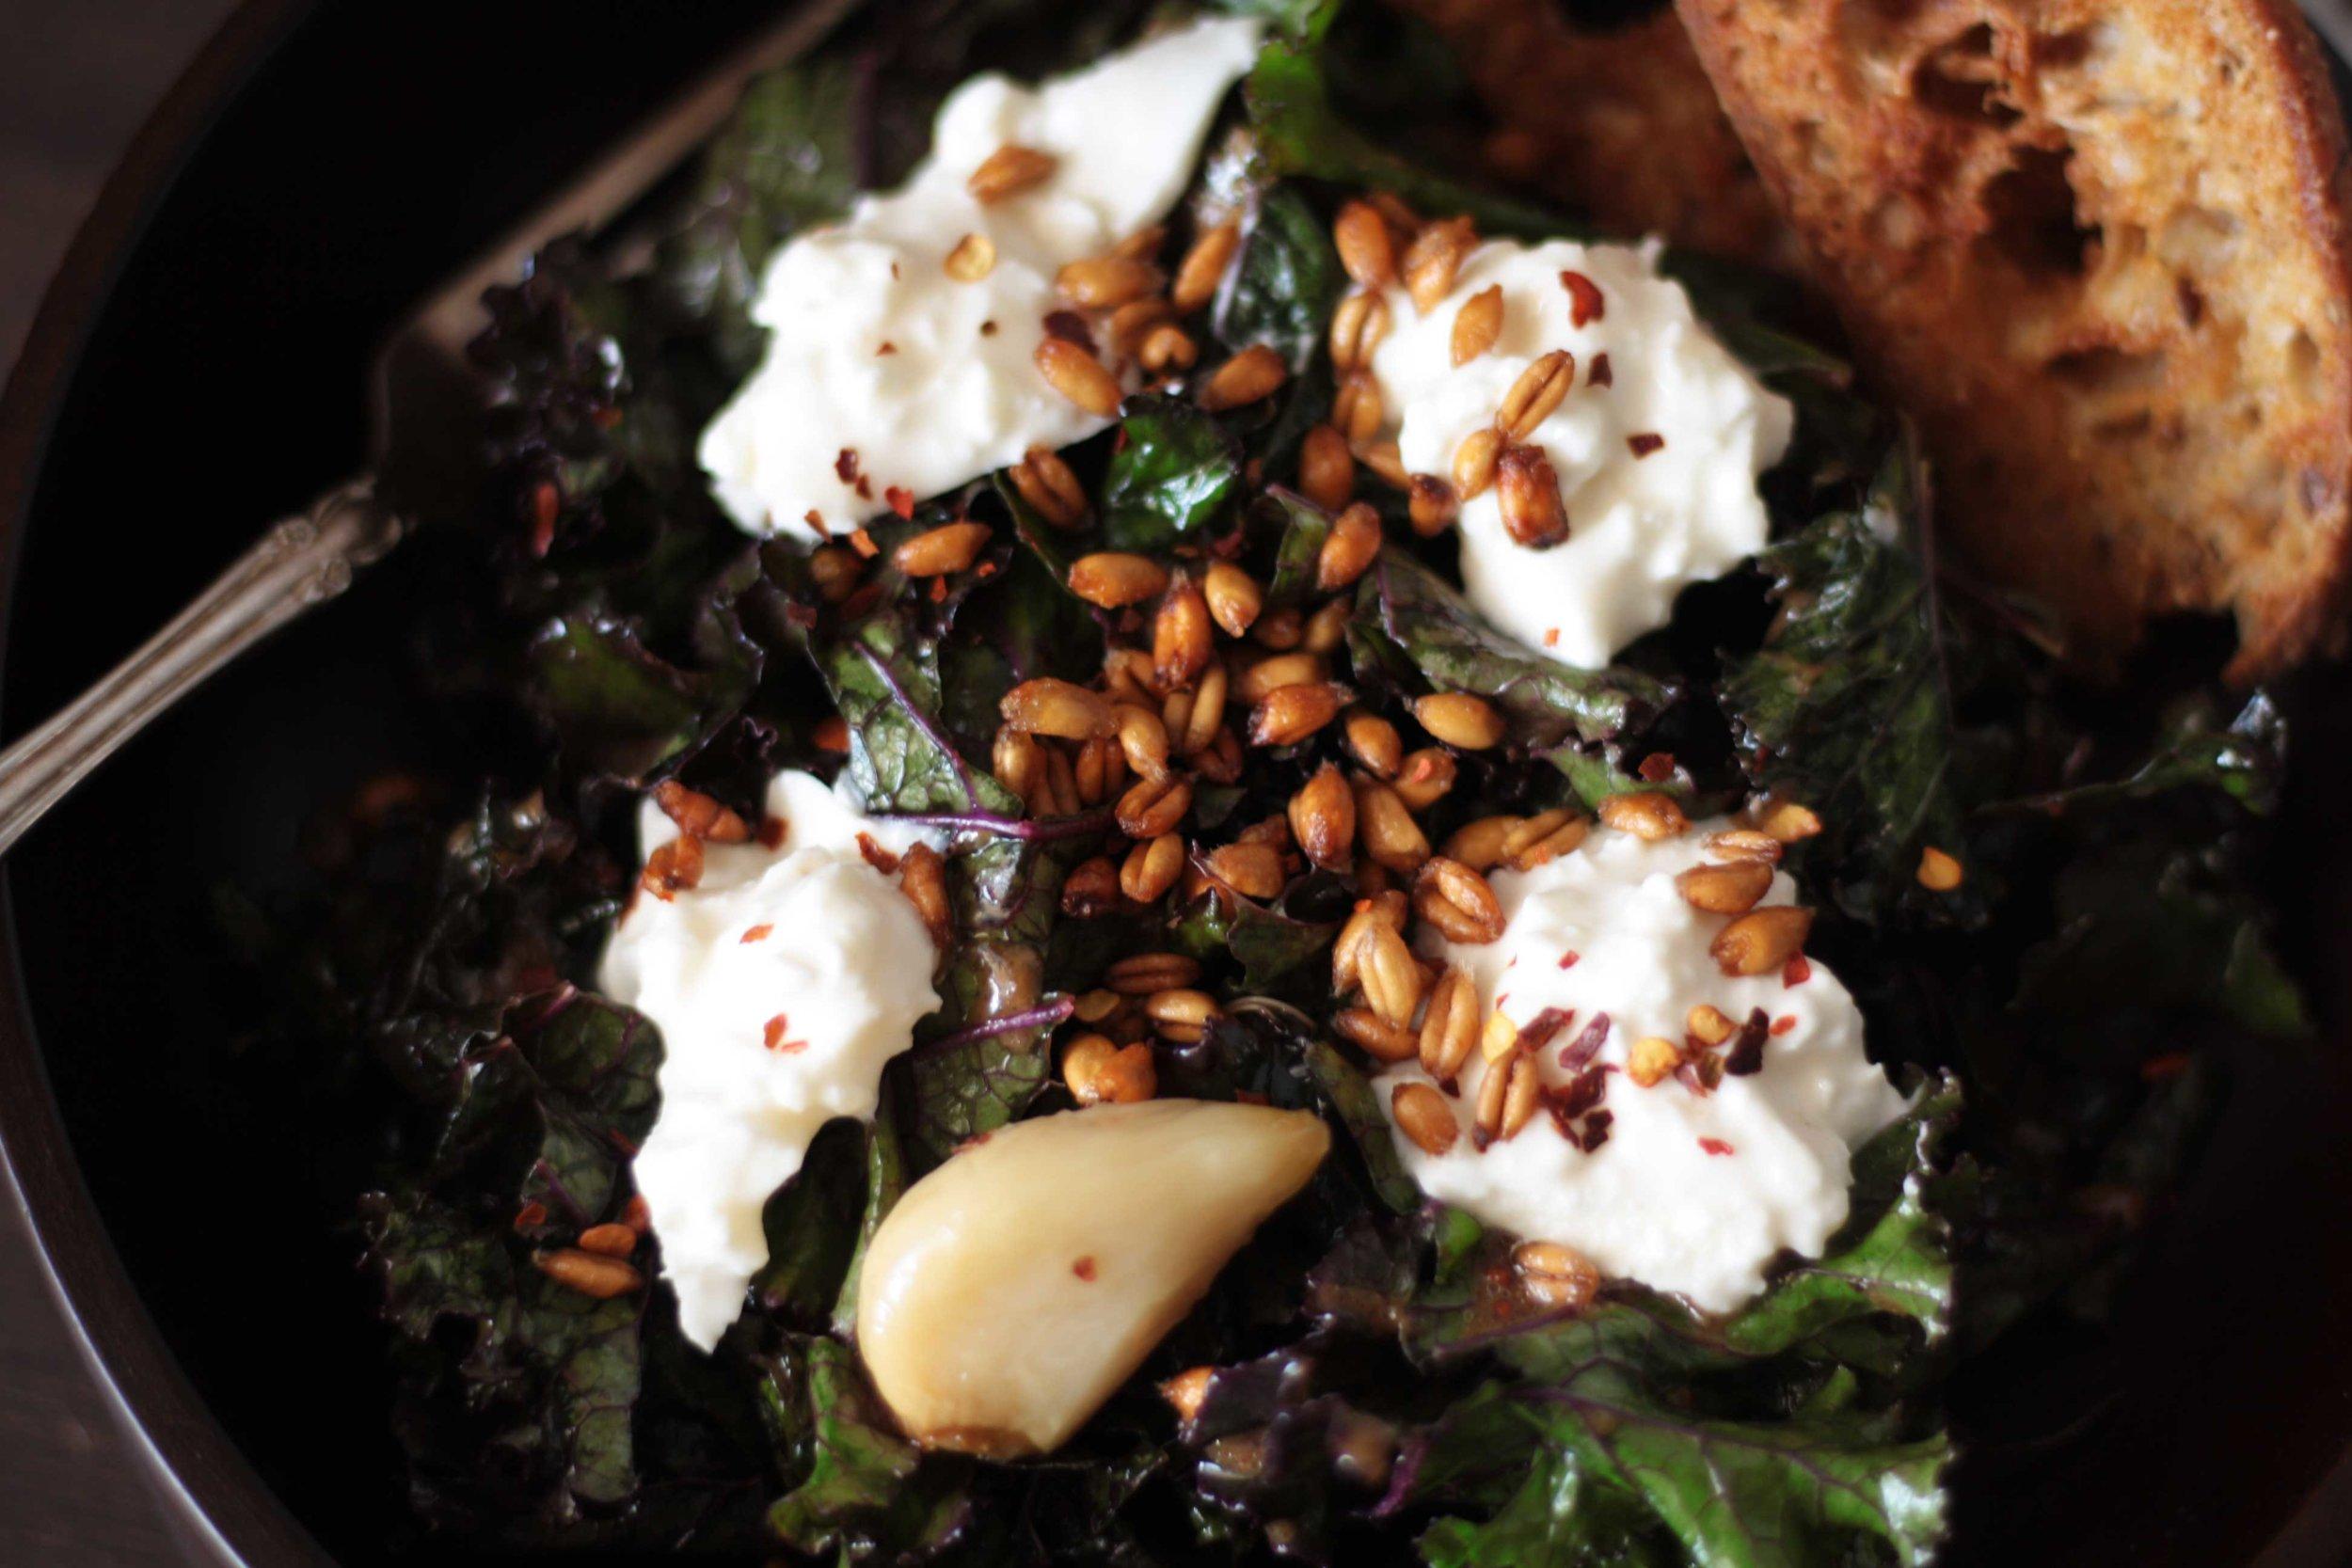 Burrata, Bruised Kale and Bread Salad with Crispy Farro